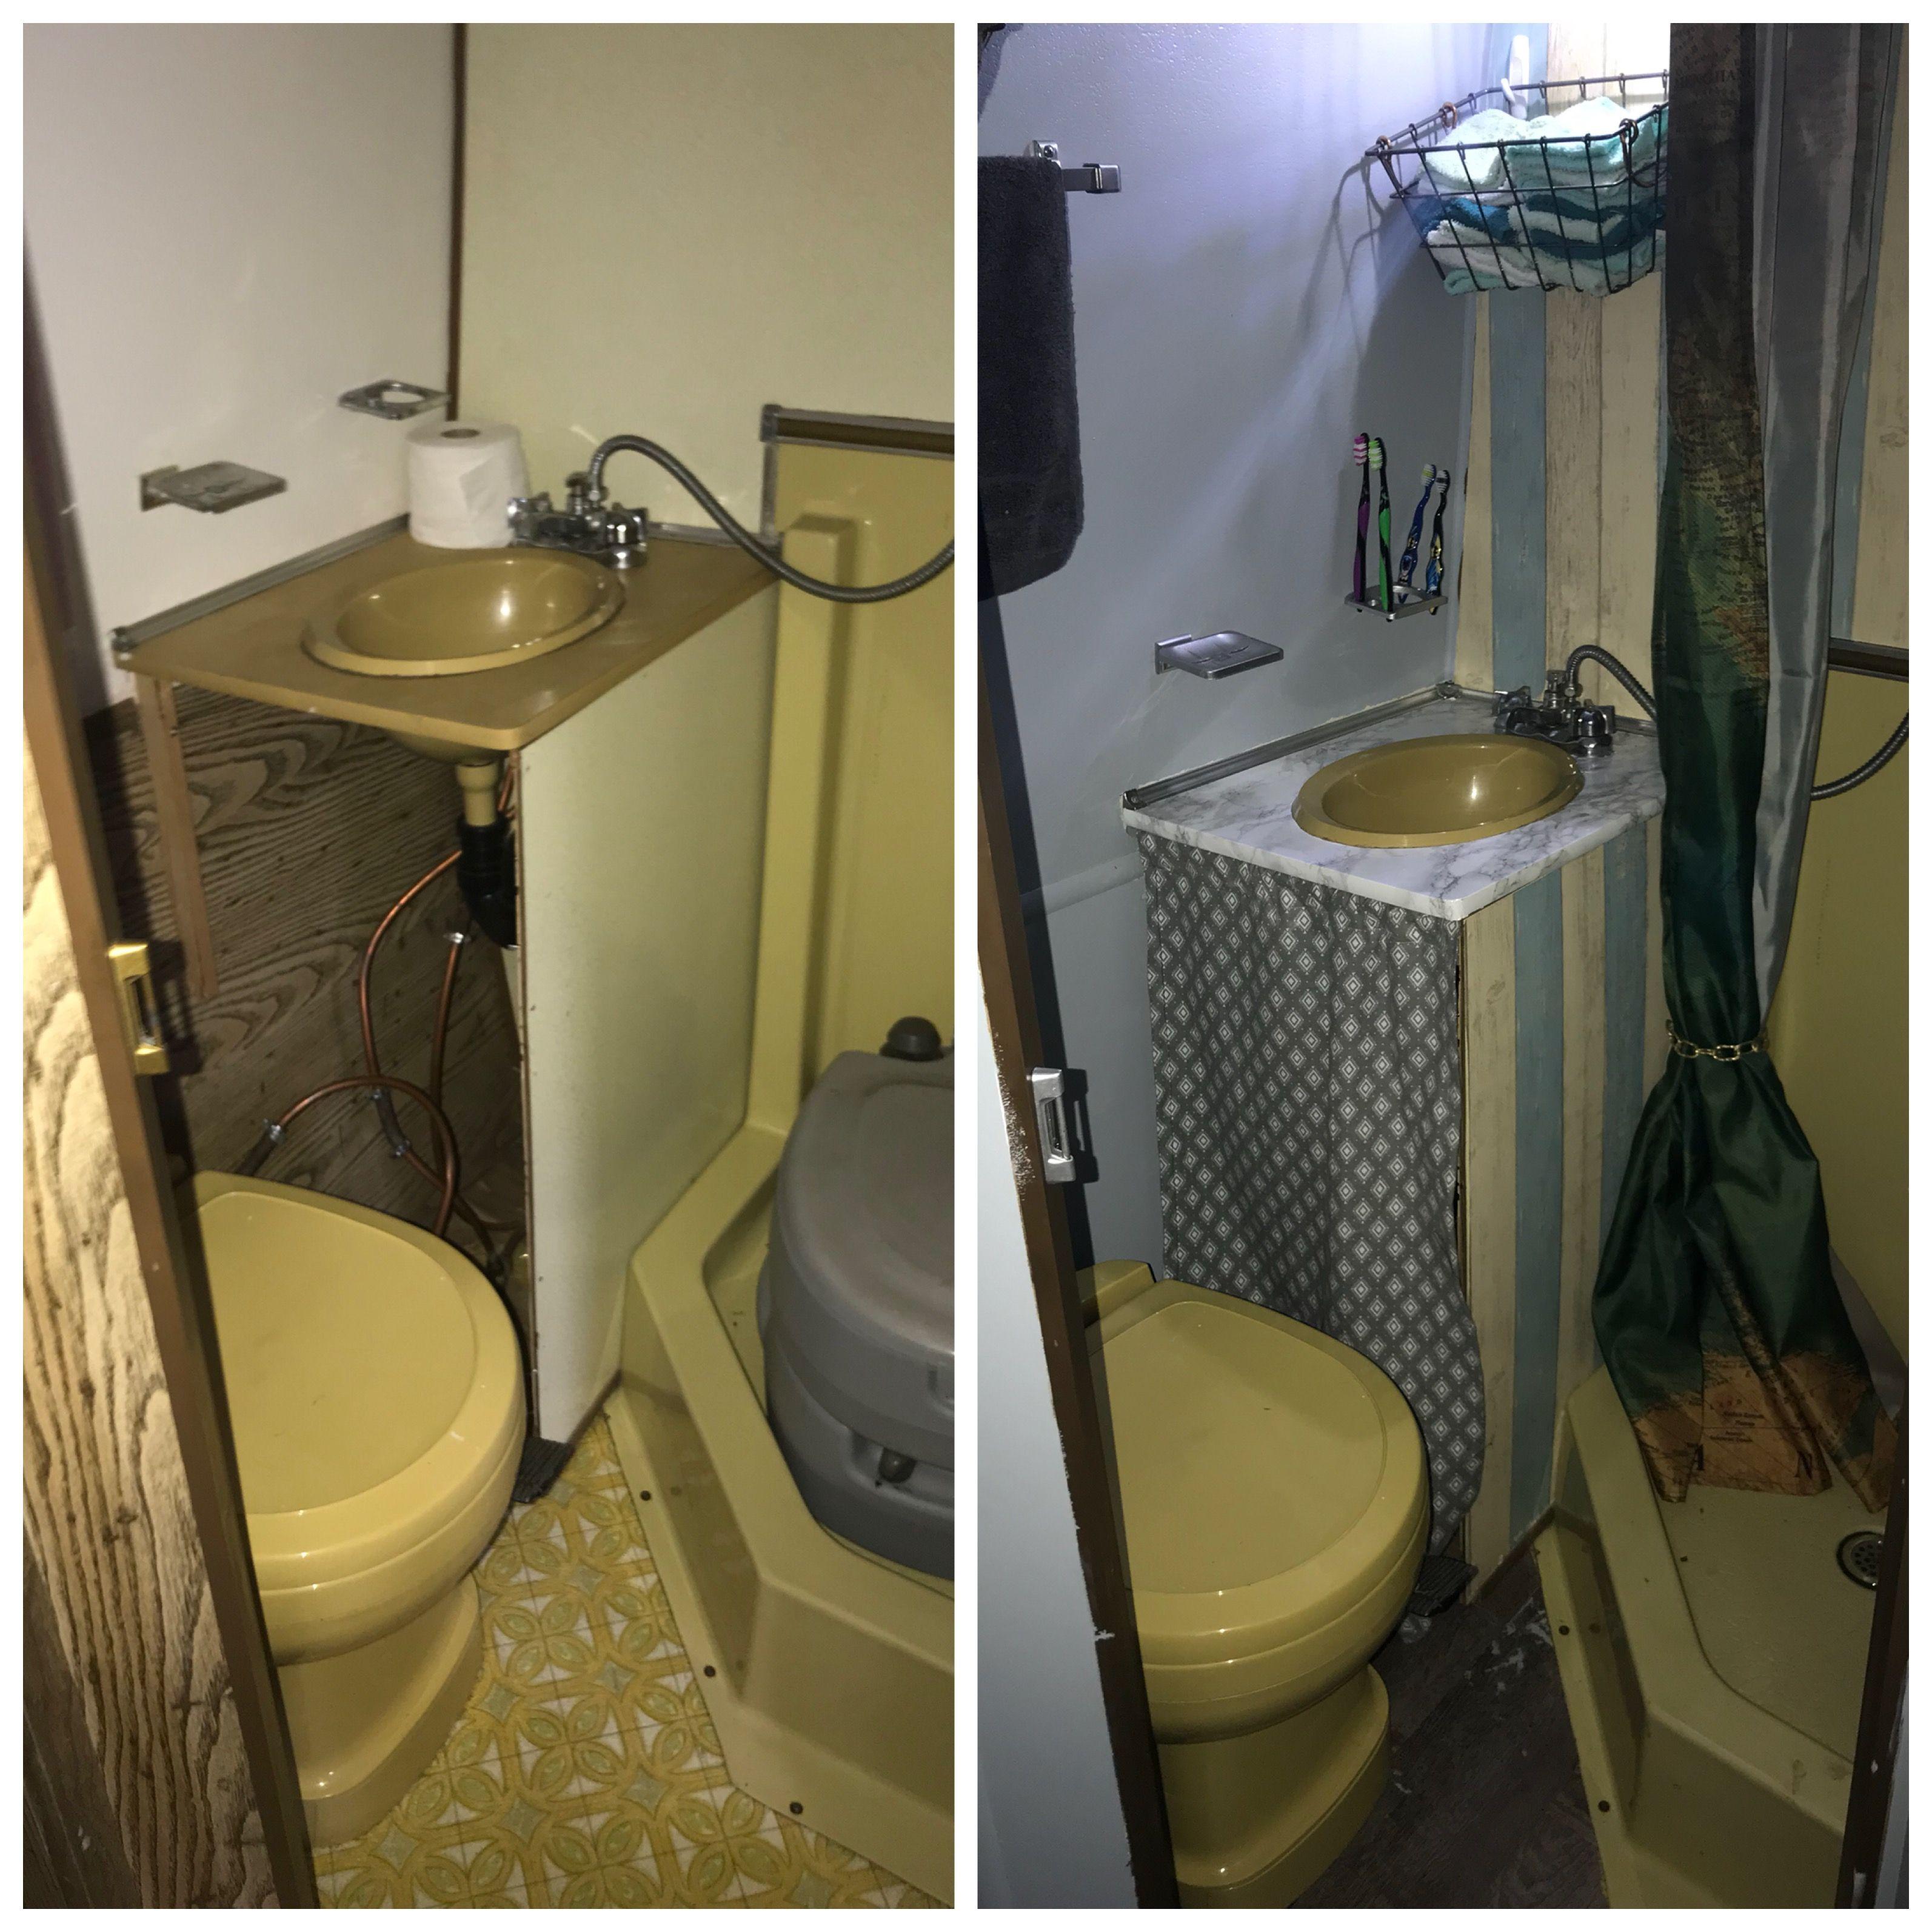 Rv Bathroom Upgrade Bathroom Small Bathroom Storage Bathroom Upgrades [ 3187 x 3187 Pixel ]